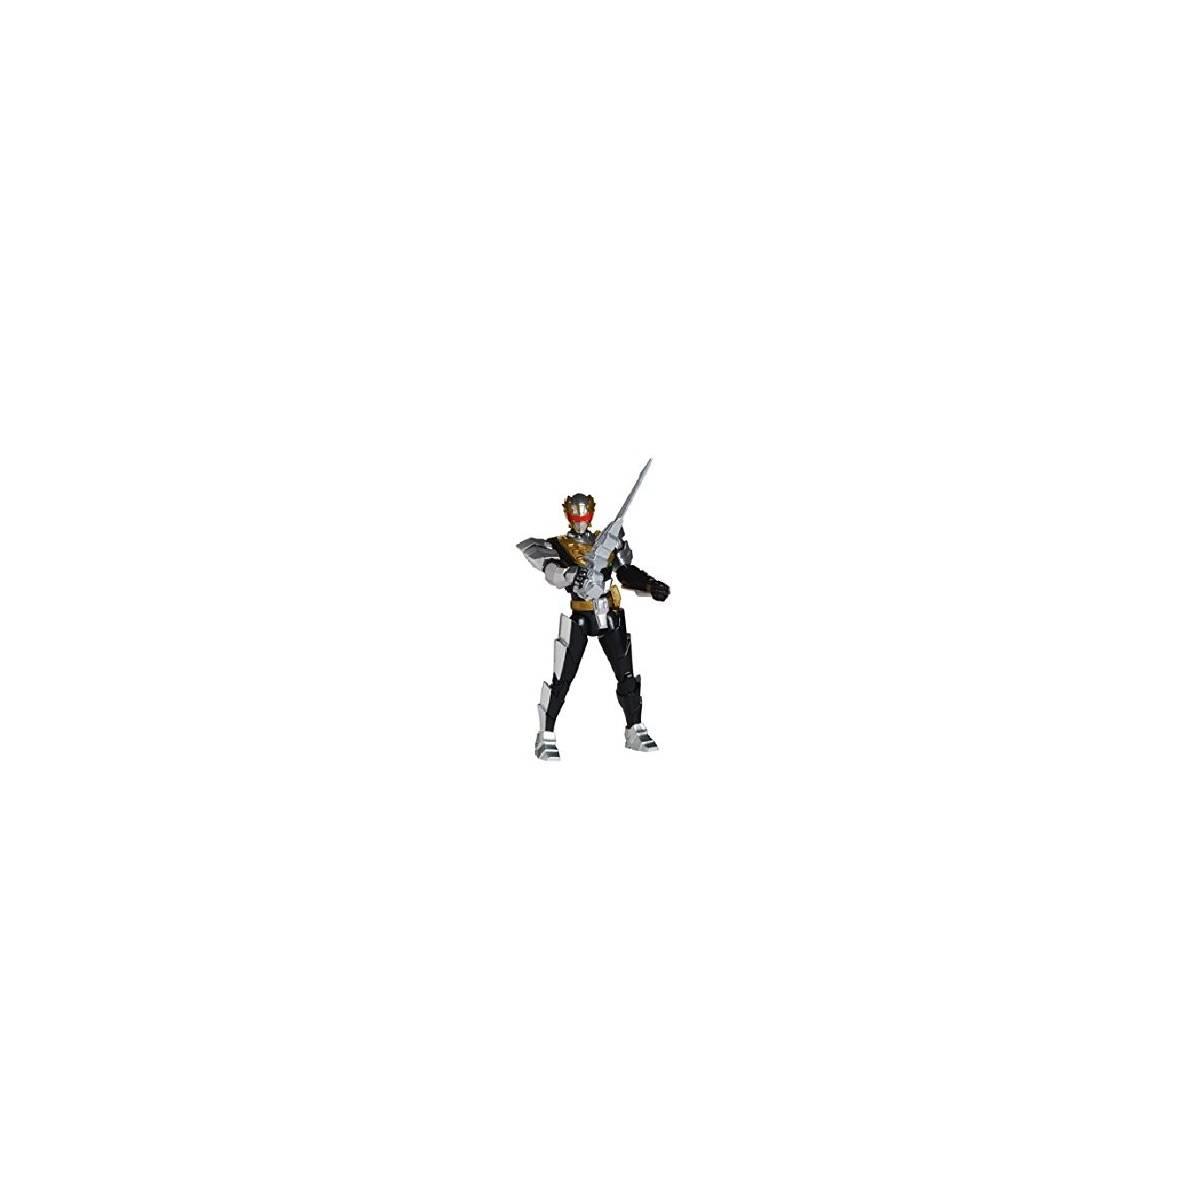 Power Rangers - Figurine - MegaForce 10 cm - Robo Knight